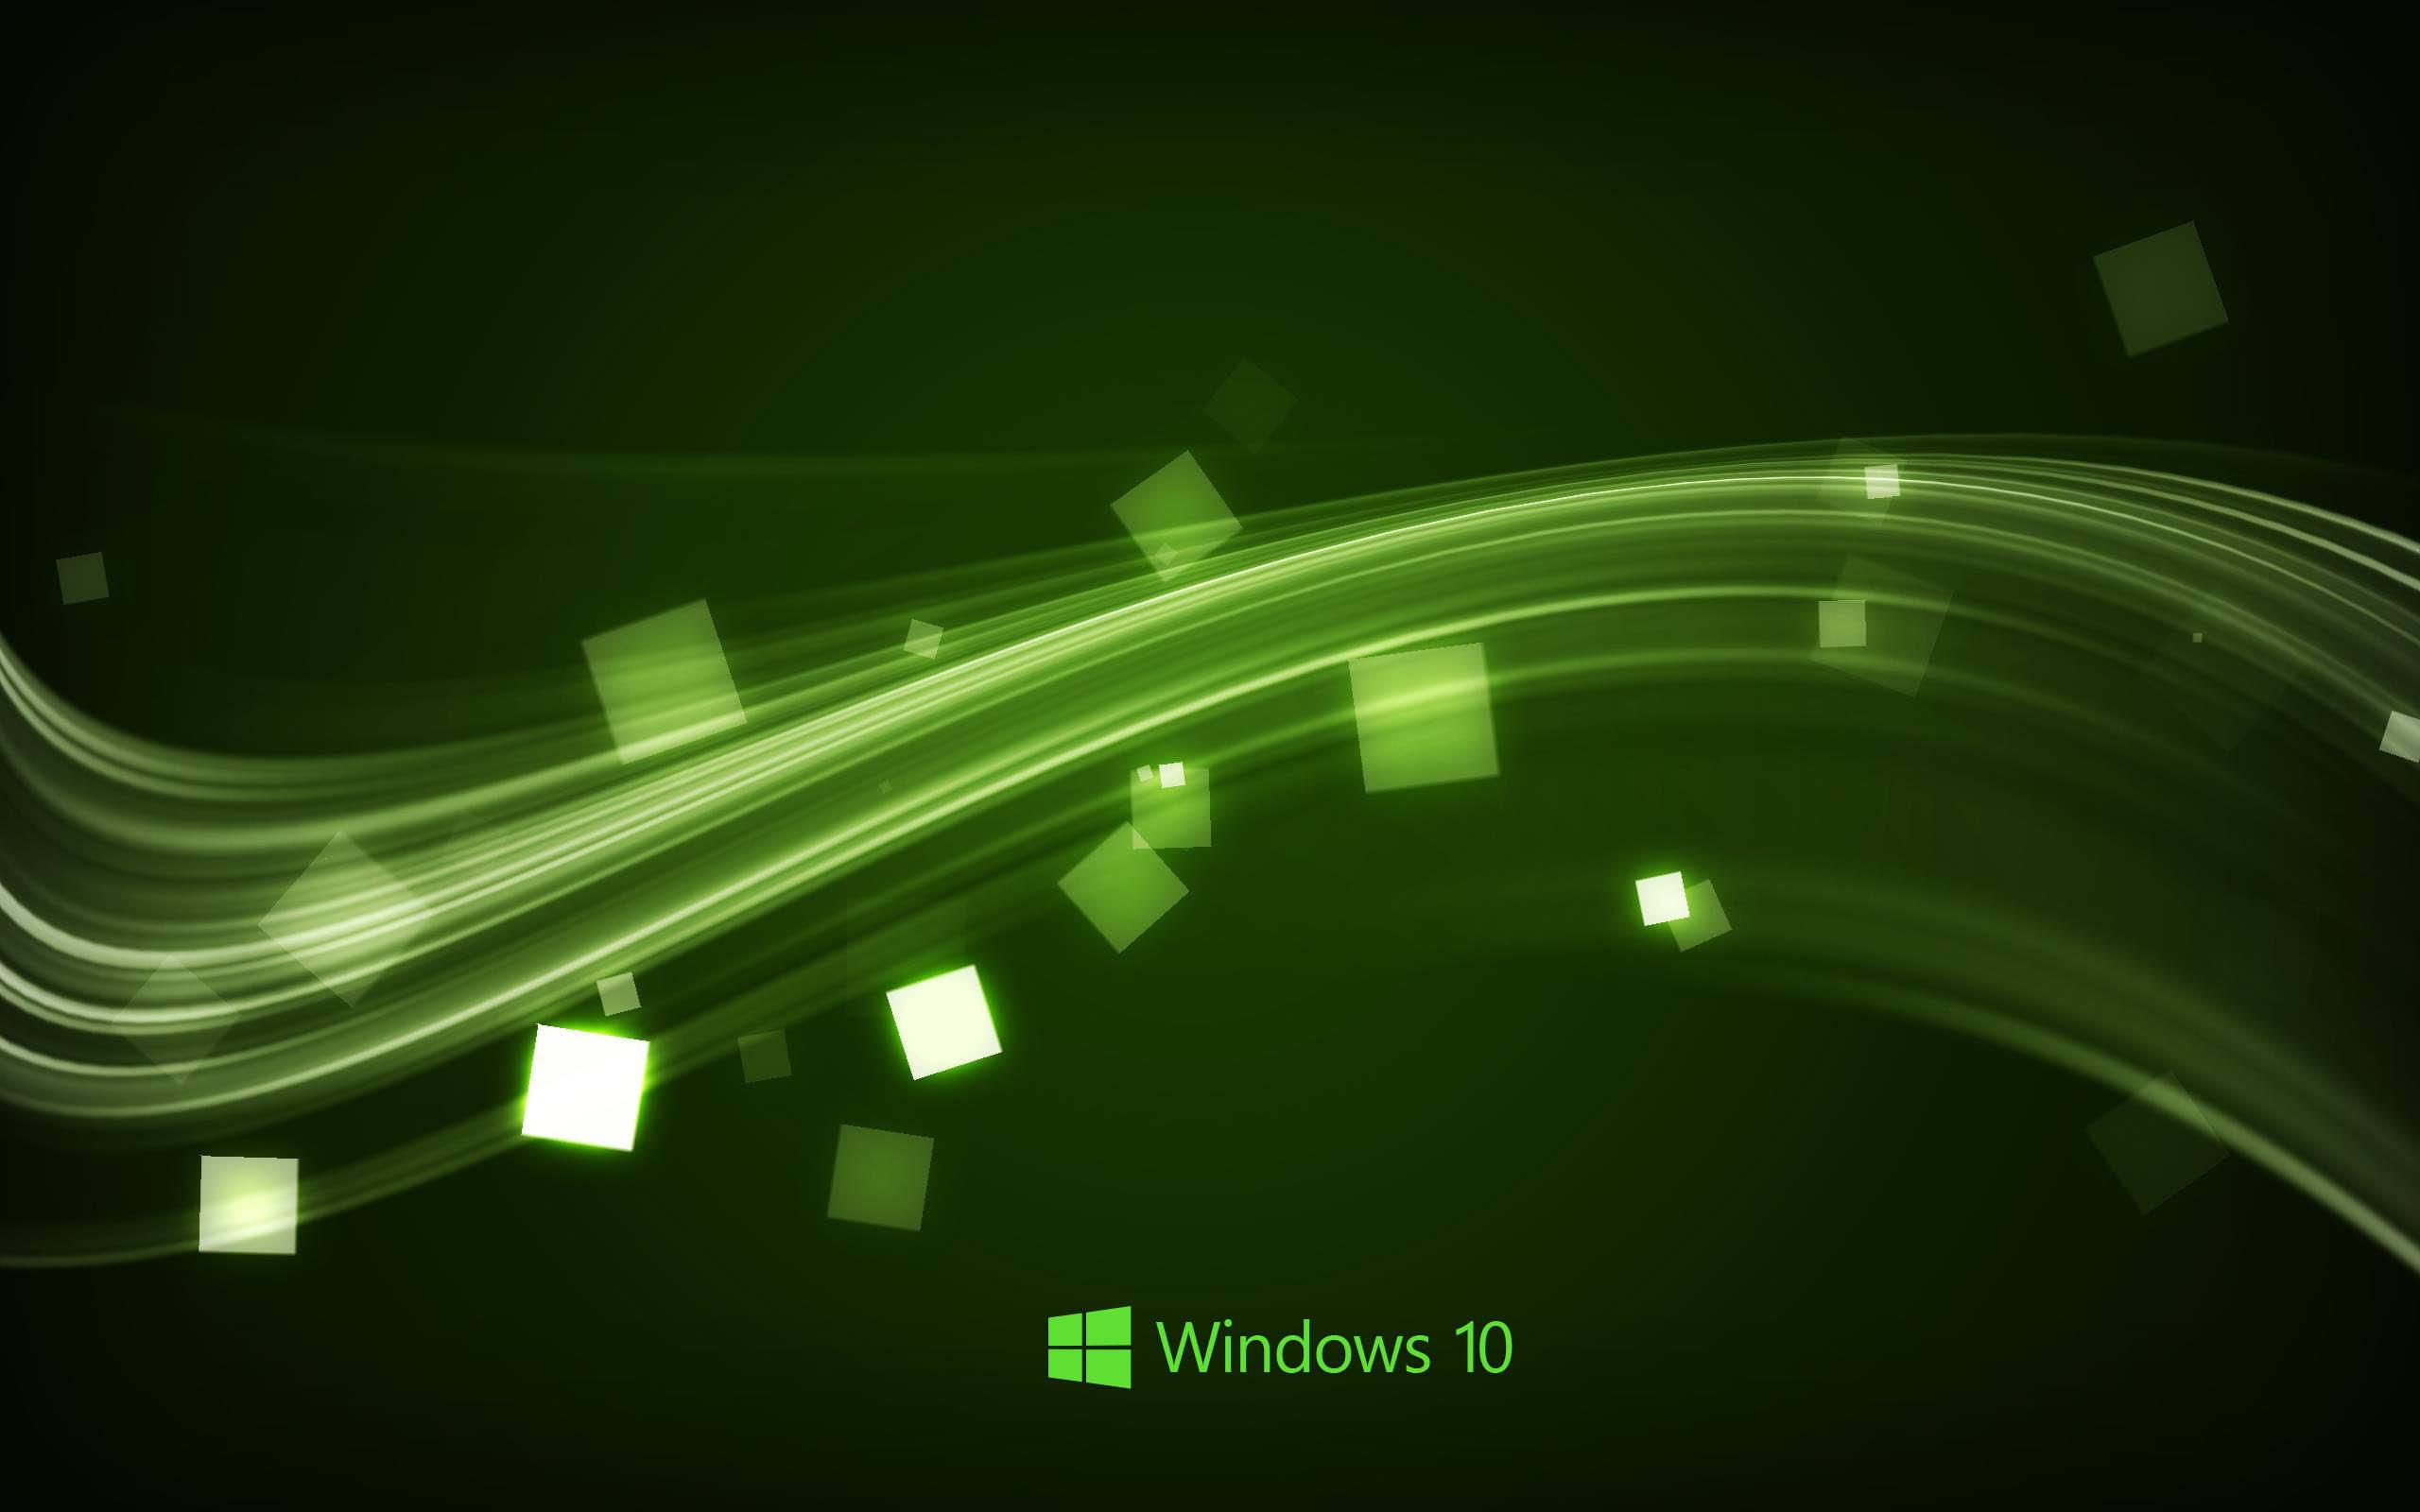 Microsoft Windows 10 Wallpaper High Definition 15255 – Amazing .